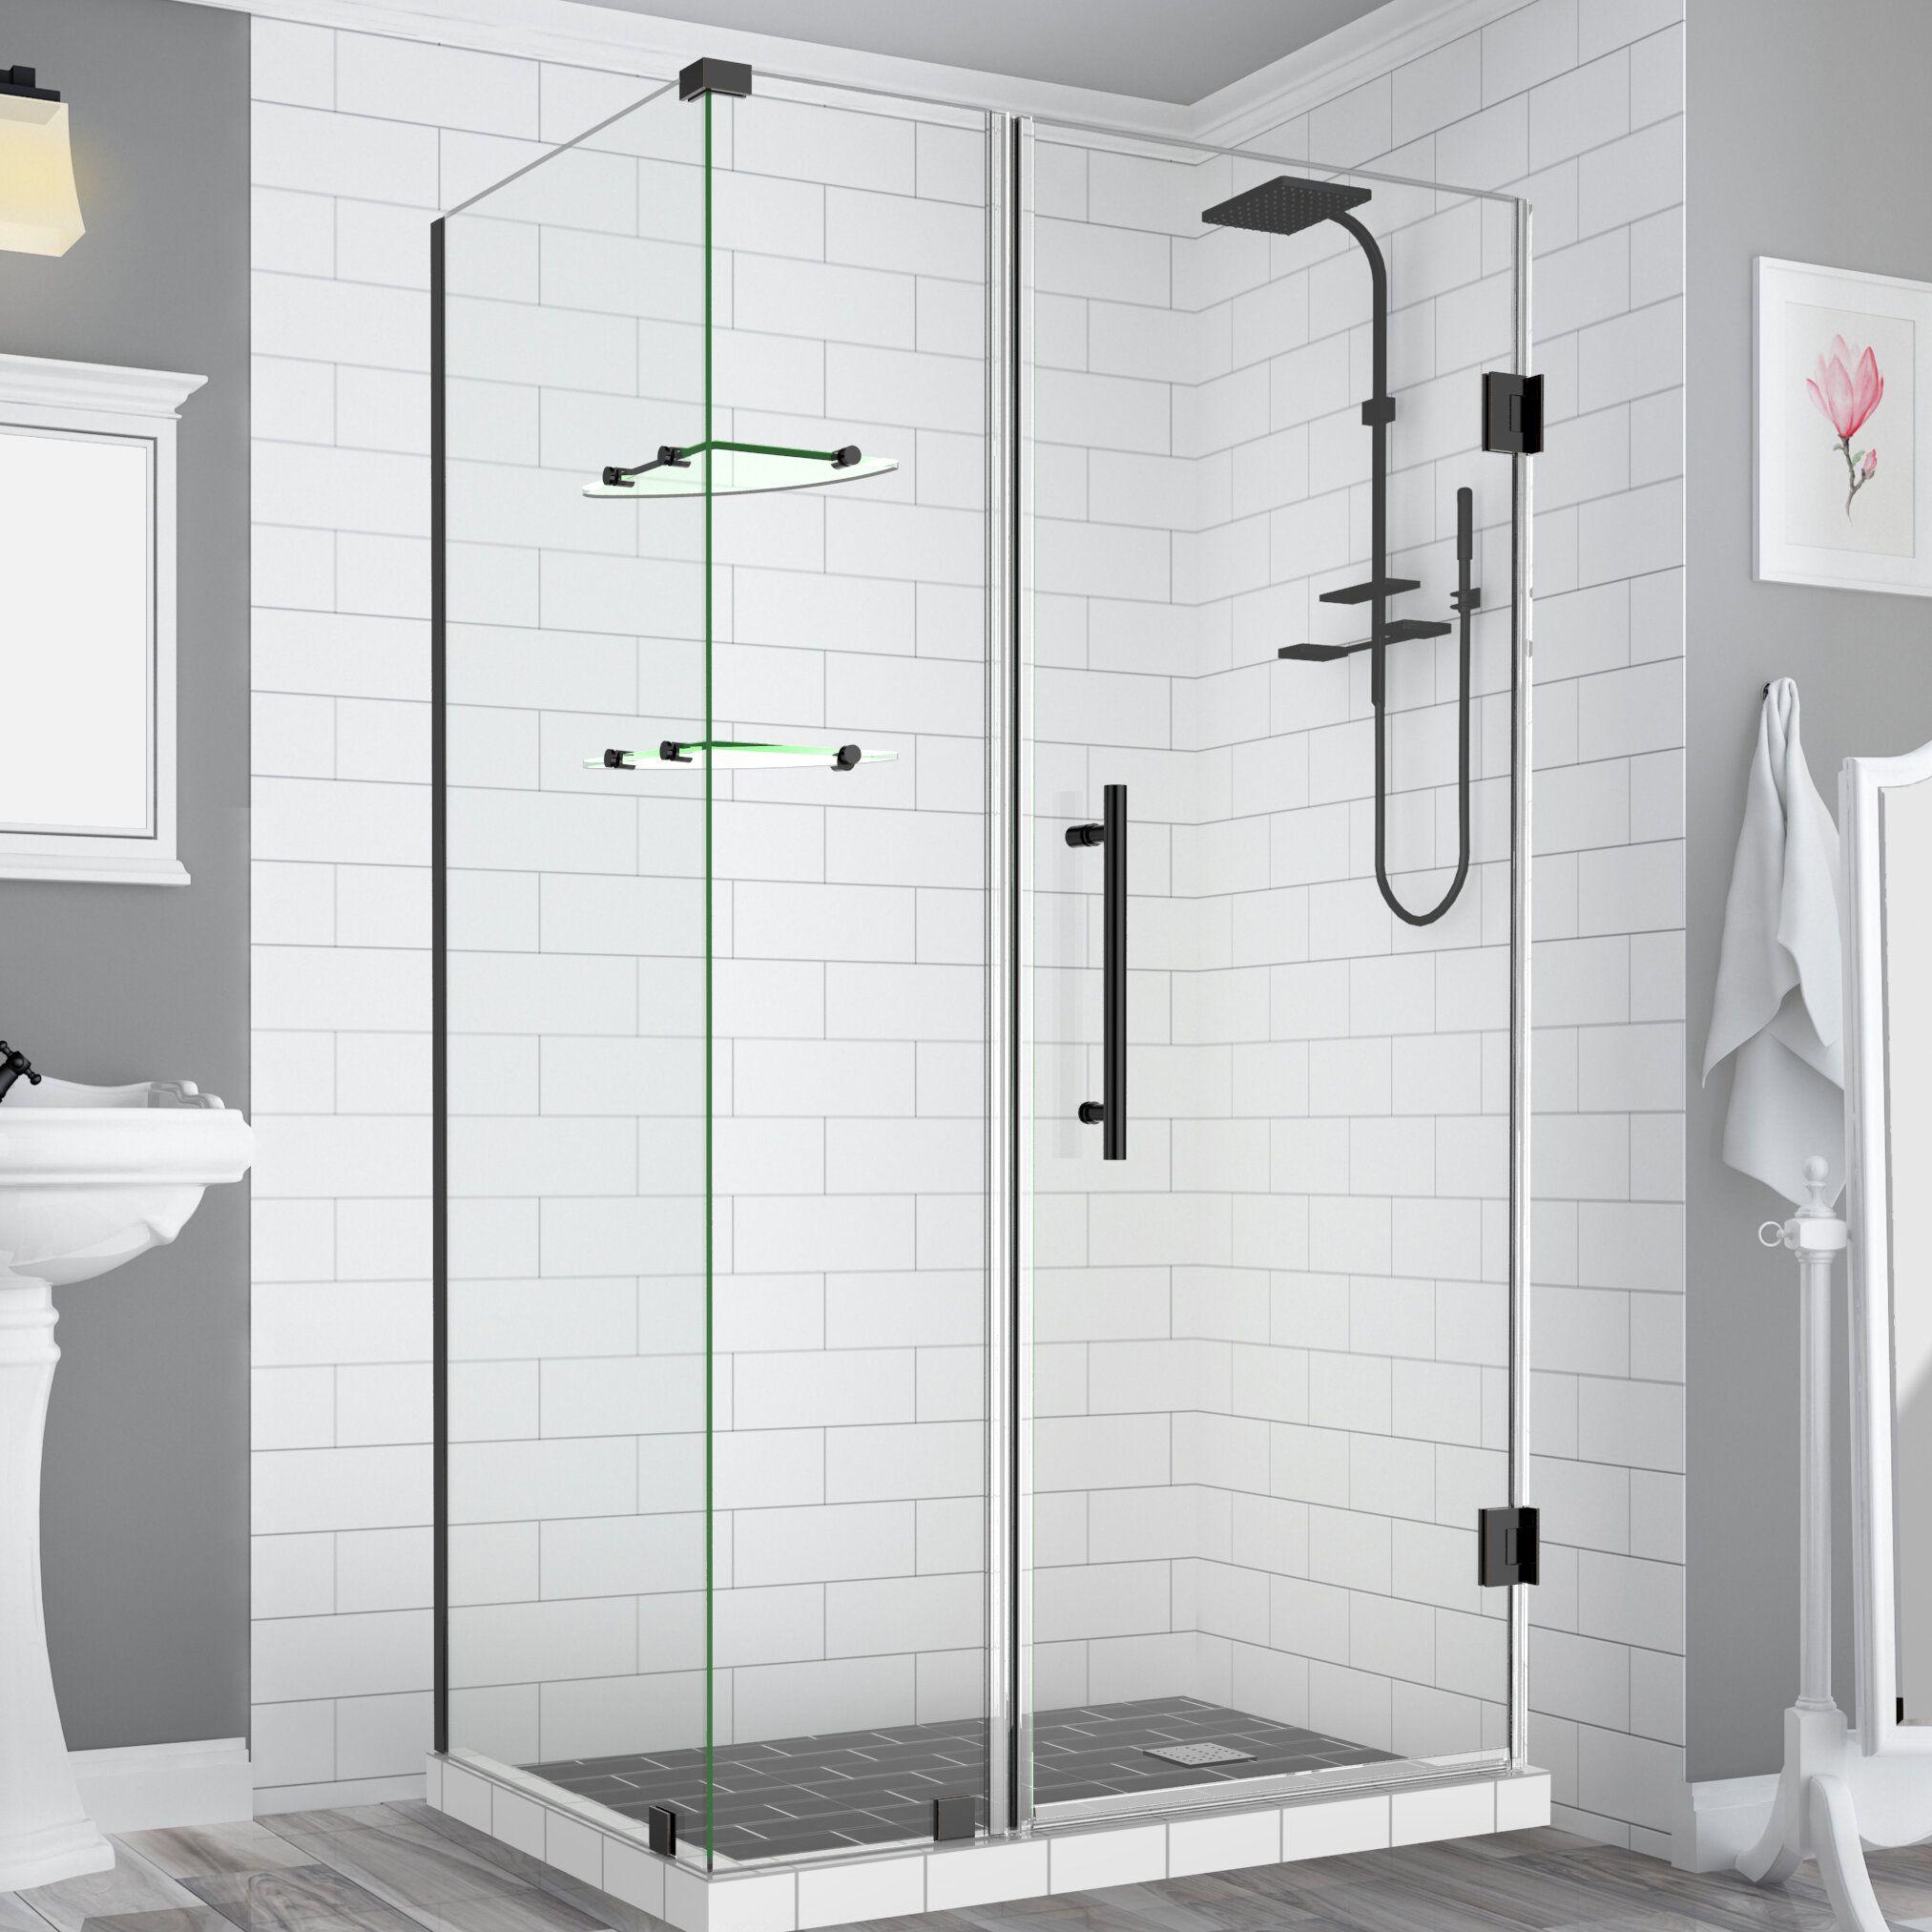 Https Secure Img1 Fg Wfcdn Com Im 89916962 Compr R85 7279 72796056 Bromley Gs Frameless In 2020 Shower Enclosure Bathroom Renovation Cost Frameless Shower Enclosures